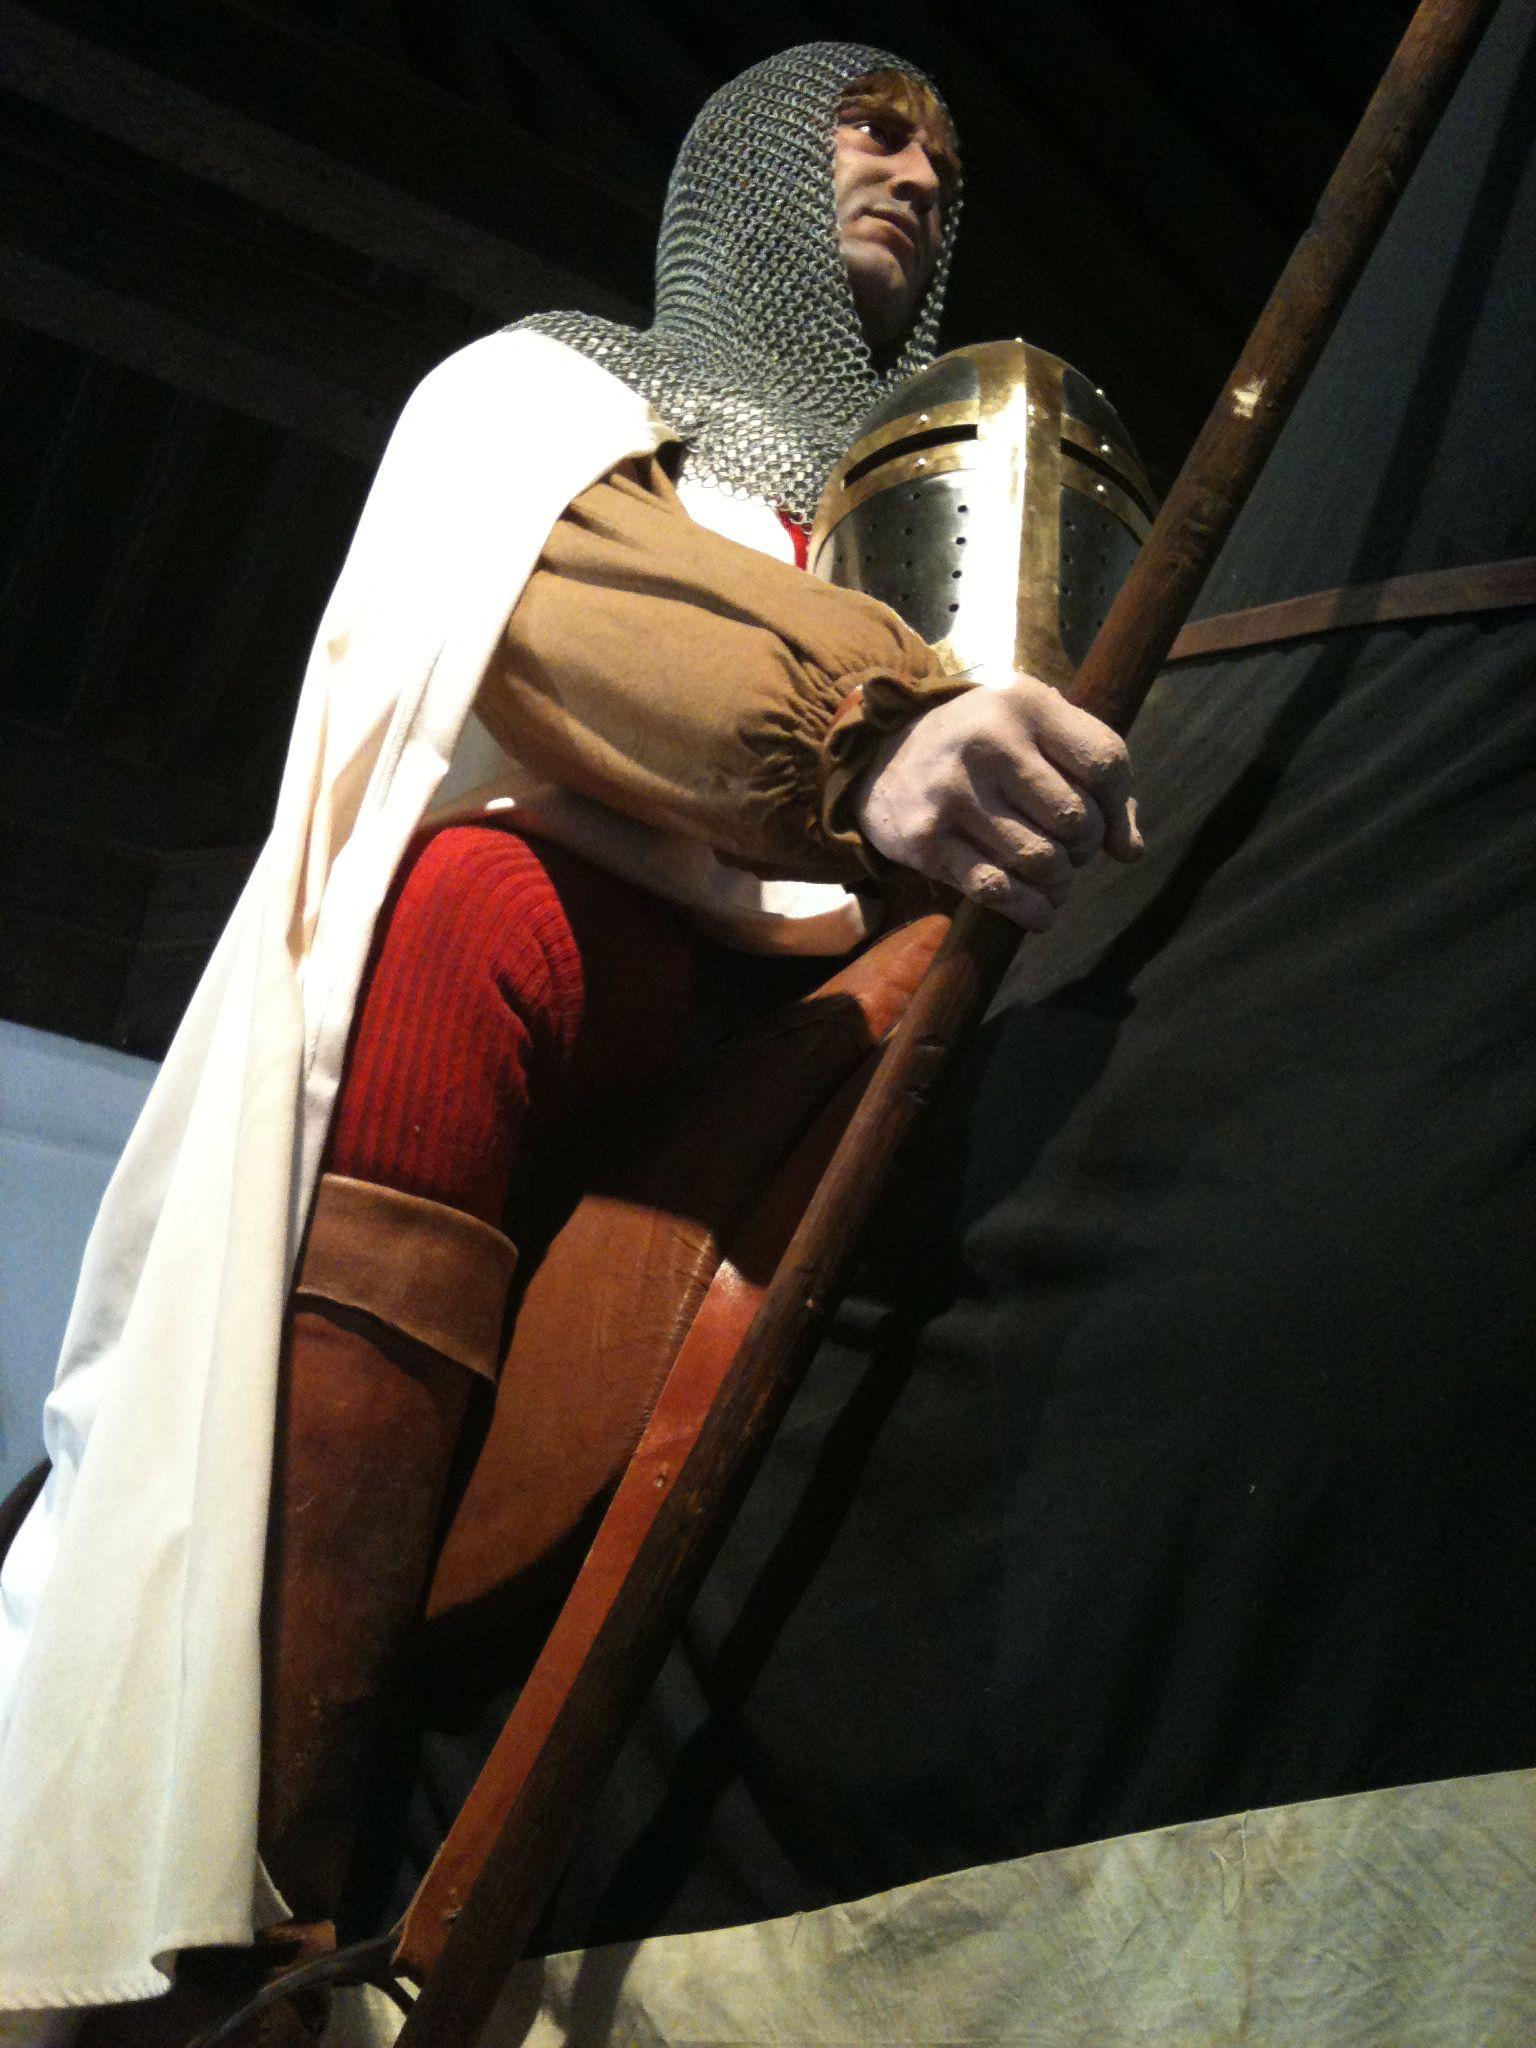 a templar knight on horseback ancient warriors cultures and